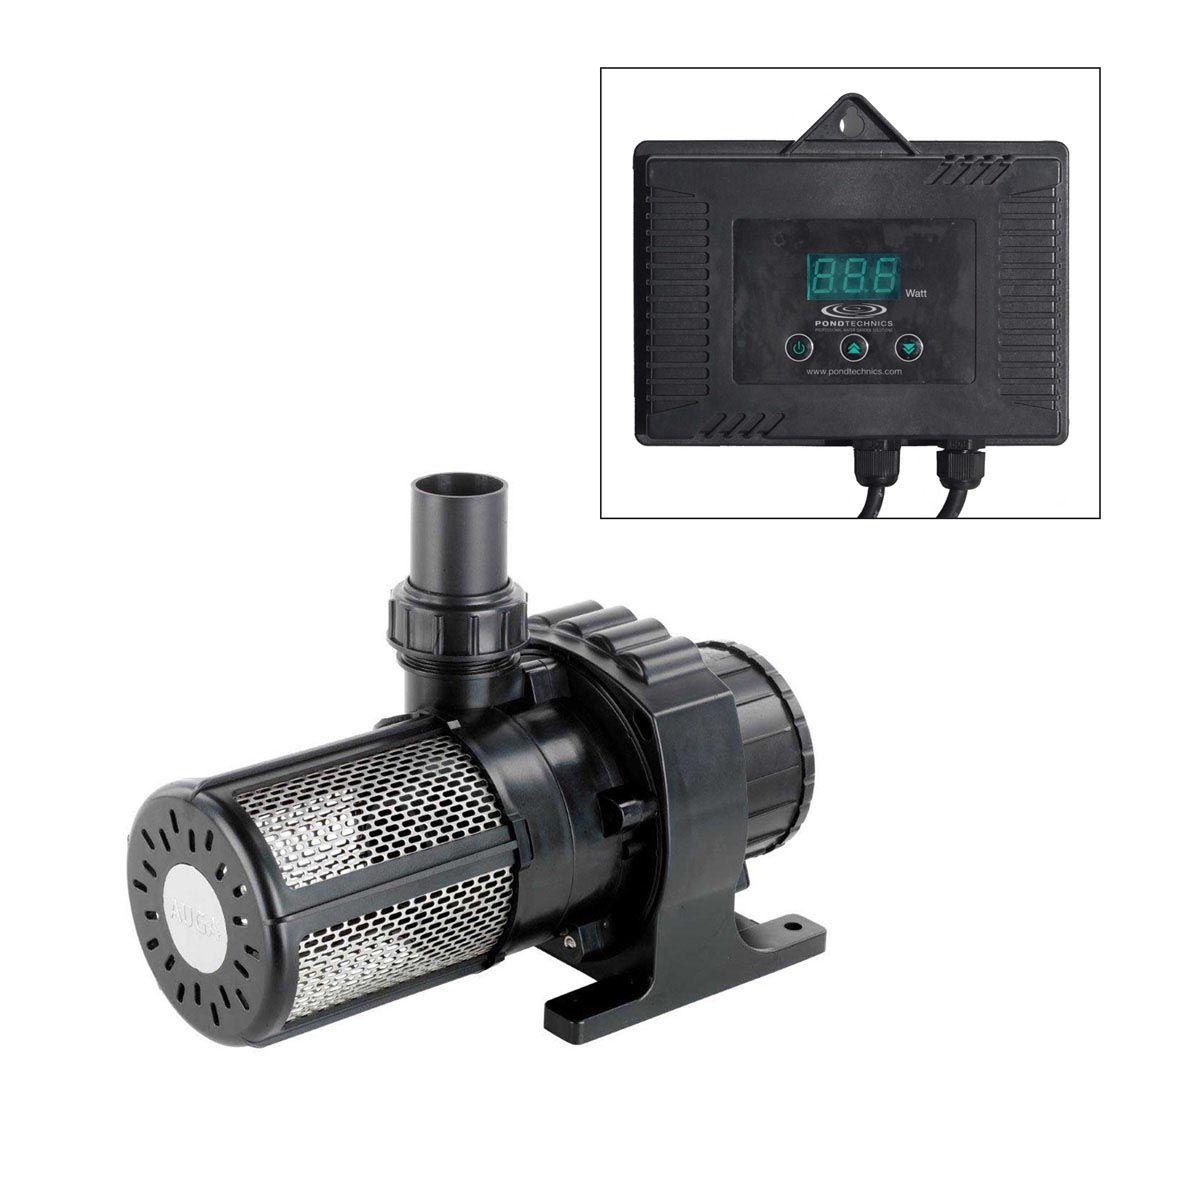 Teichpumpe Viviopro 20000, H max. 5.5 m, Q max. 20000 l/h, 0.20 kW, 335 x 145 x 180 mm